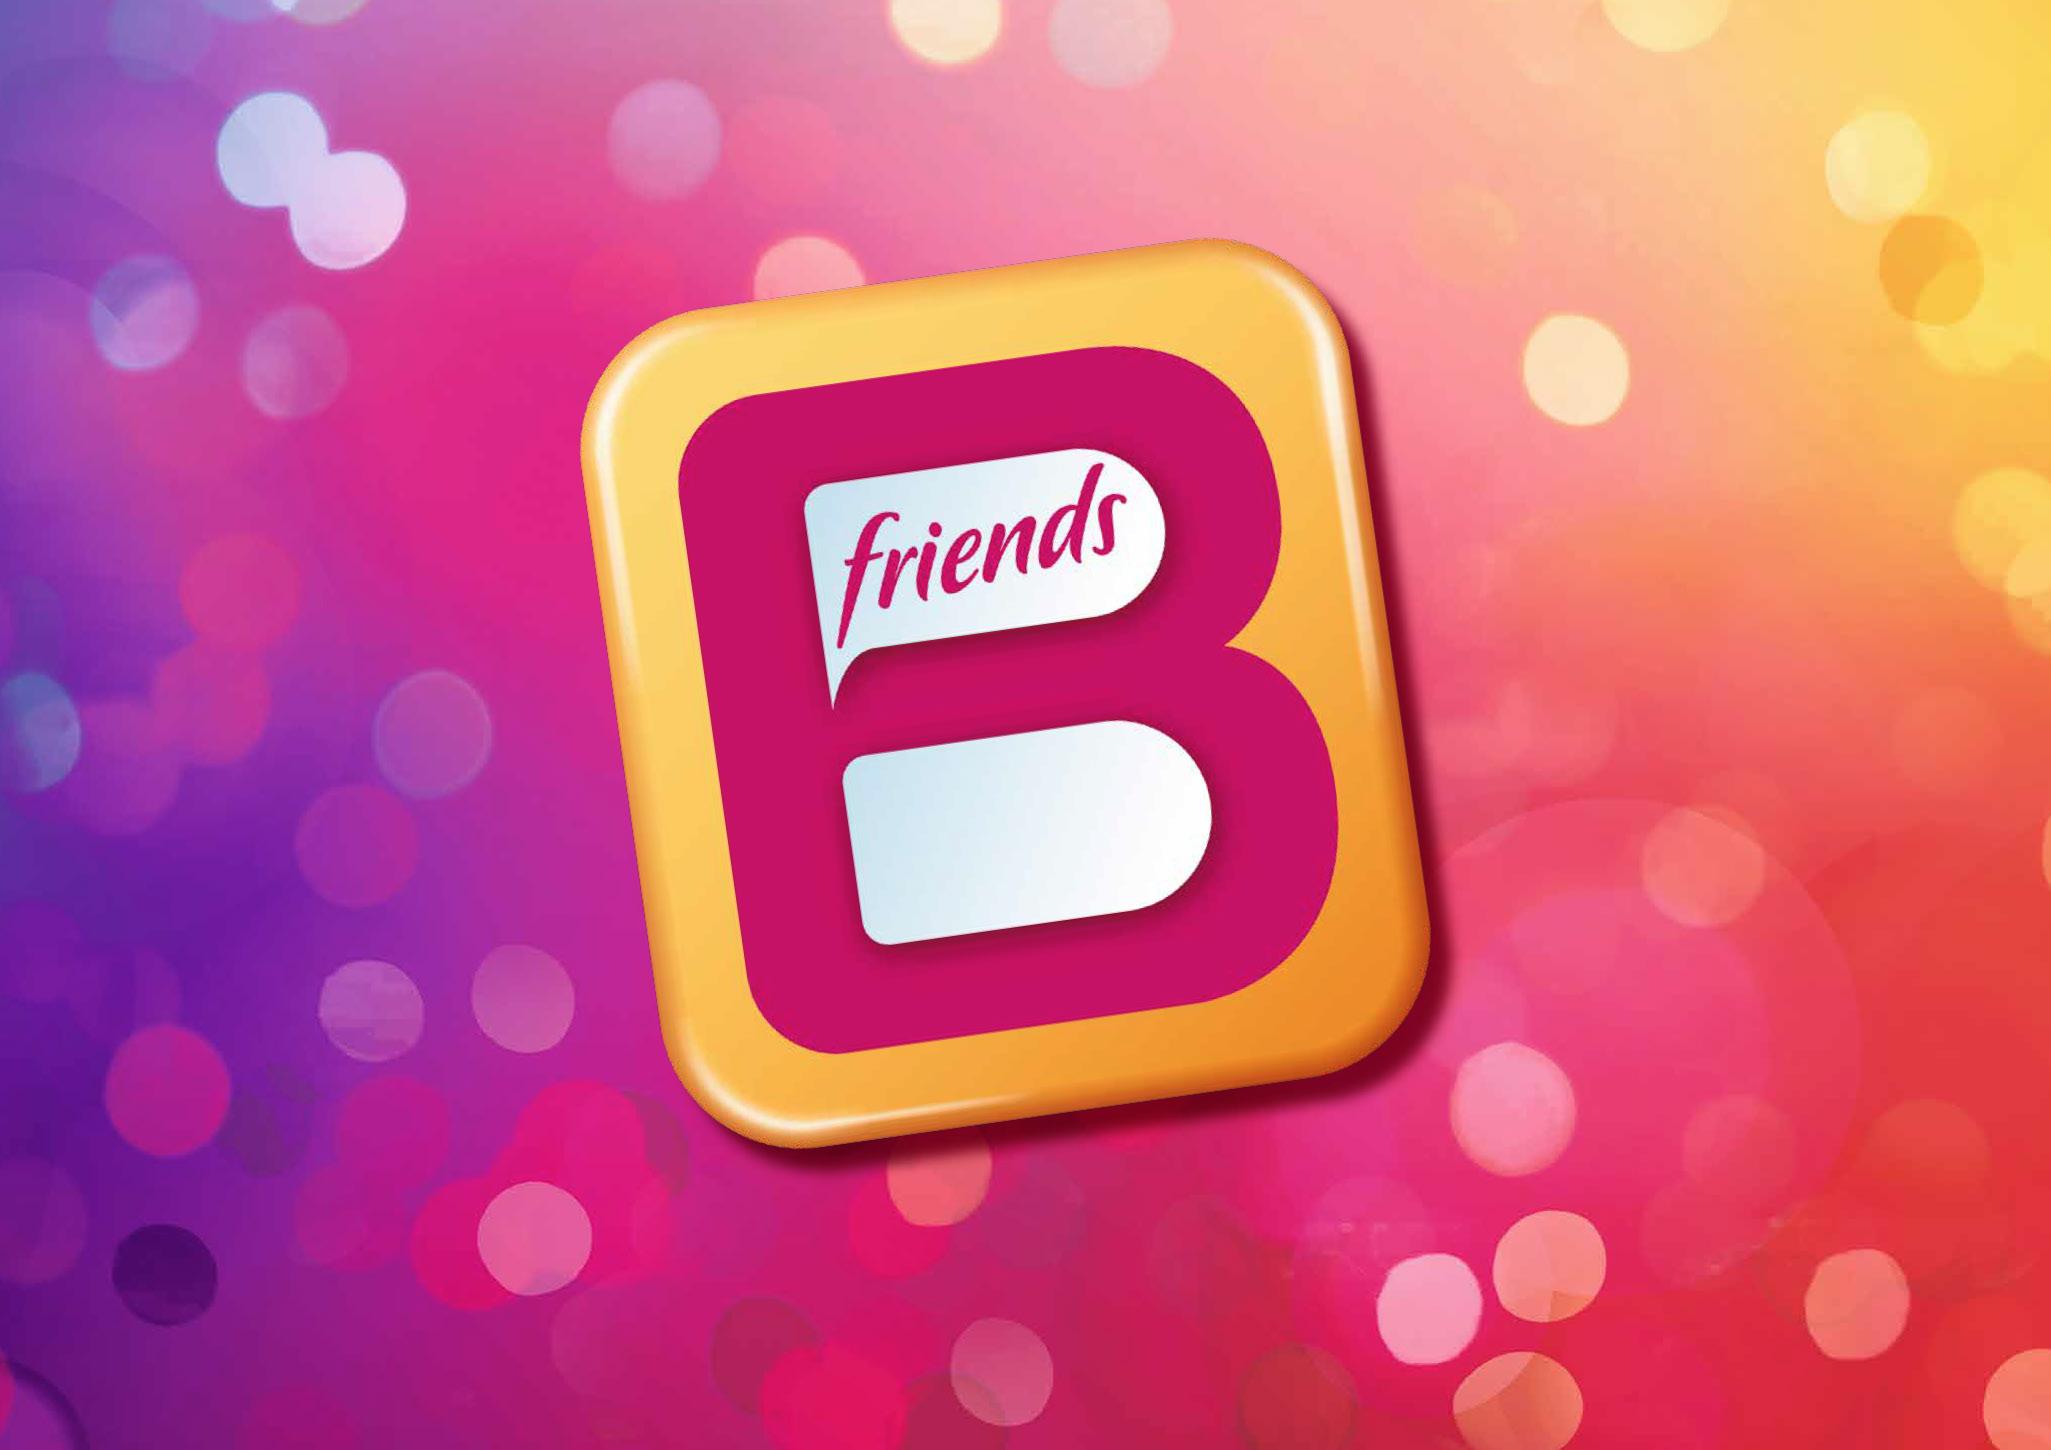 Pemberton & Whitefoord Produces Branding for BFriends